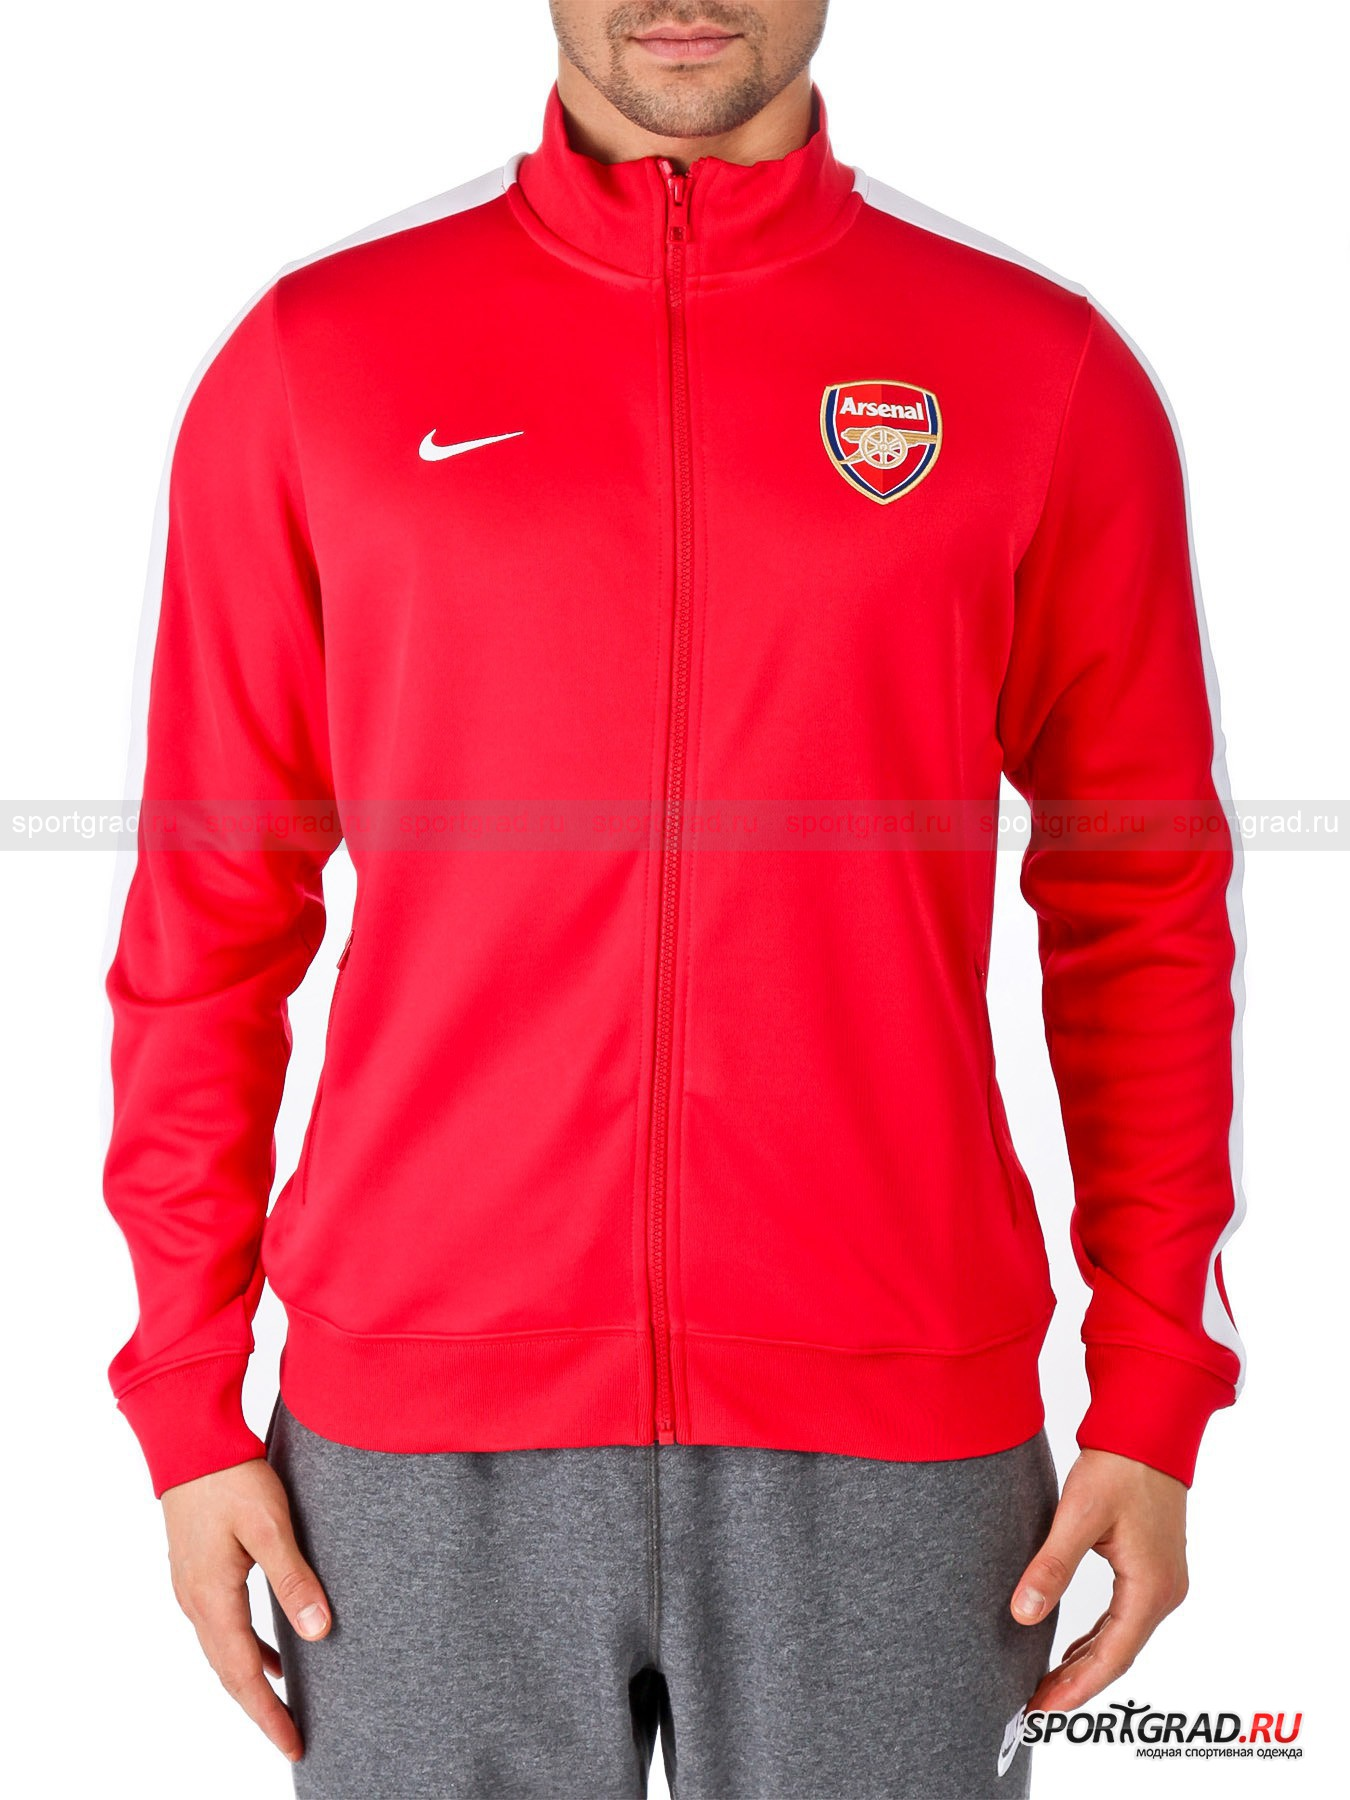 Олимпийка мужская Nike N98 AFC Auth trk jkt arsenal NIKE